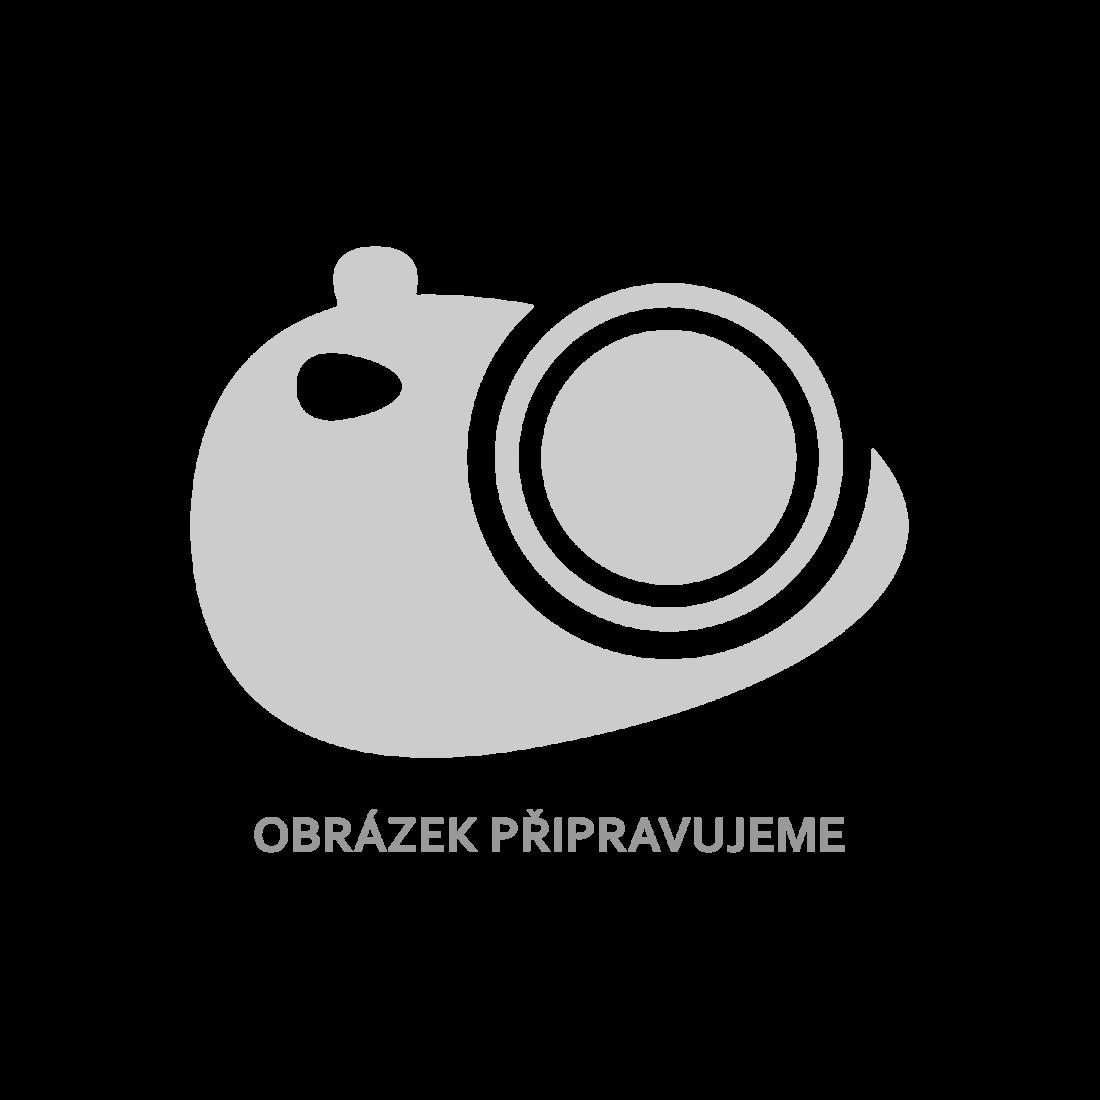 Roleta Zebra / noc a den / Twinroll 100 x 175 cm, kávová